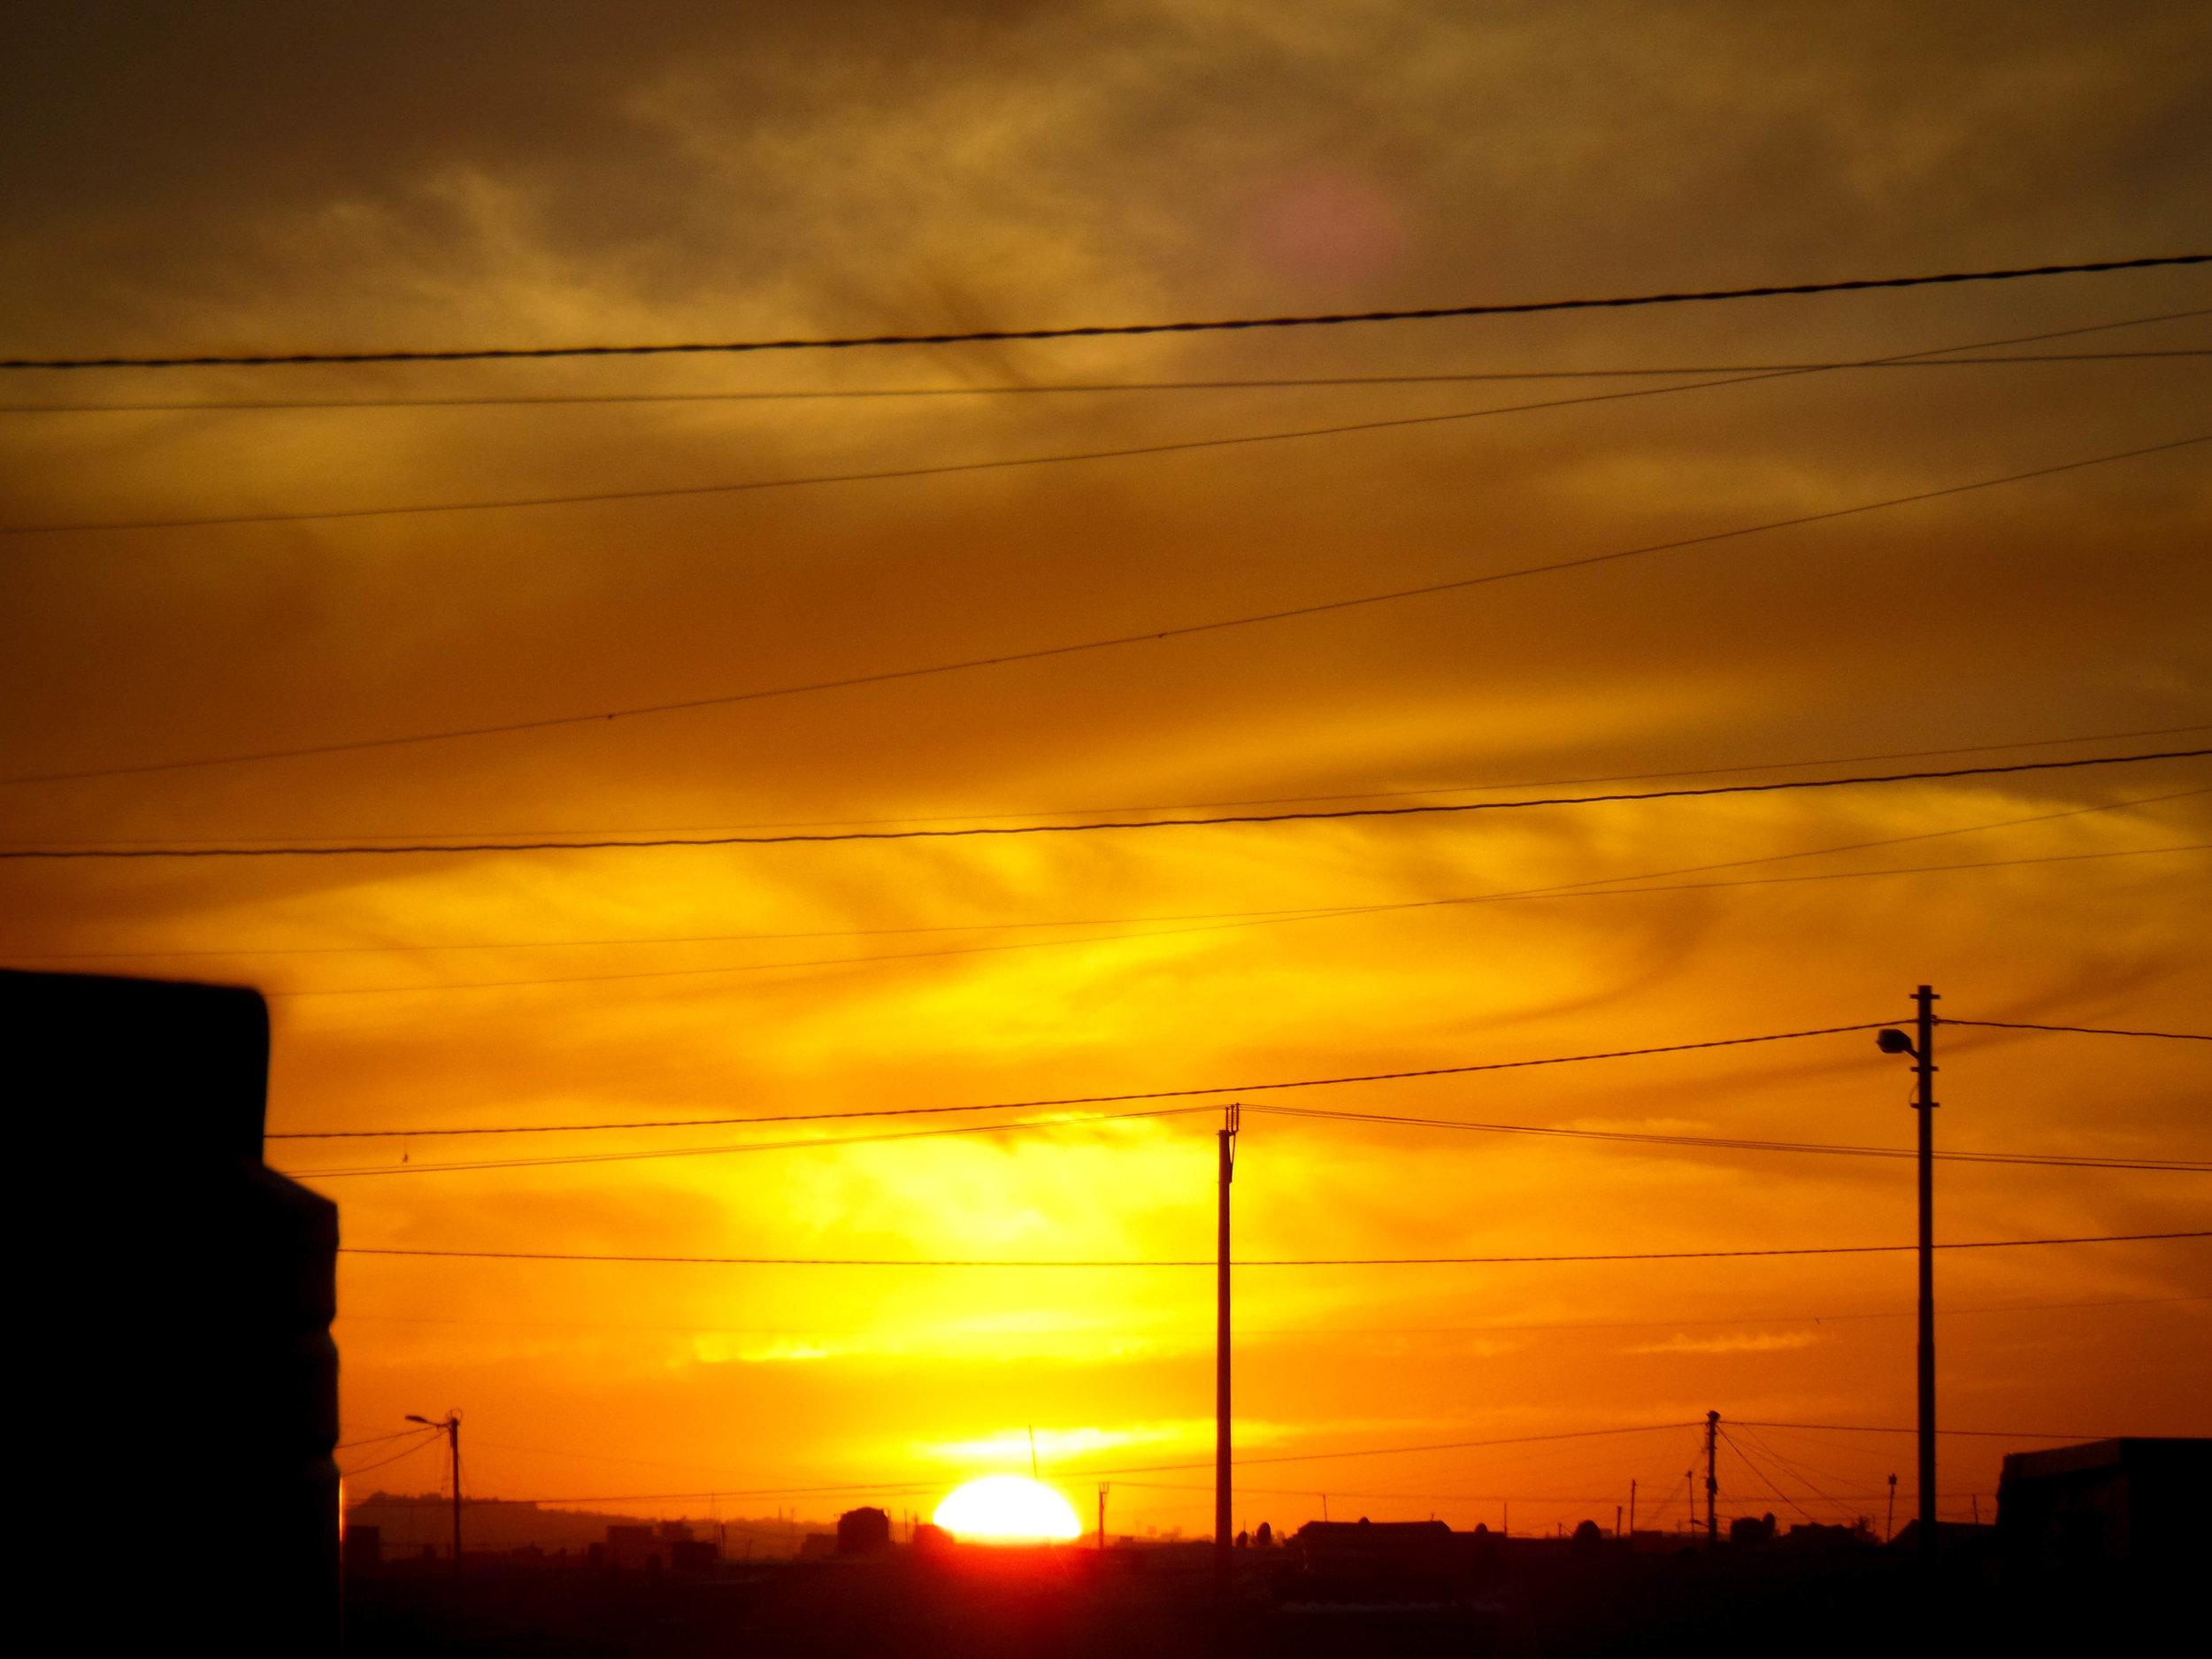 asma.sunset.jpg